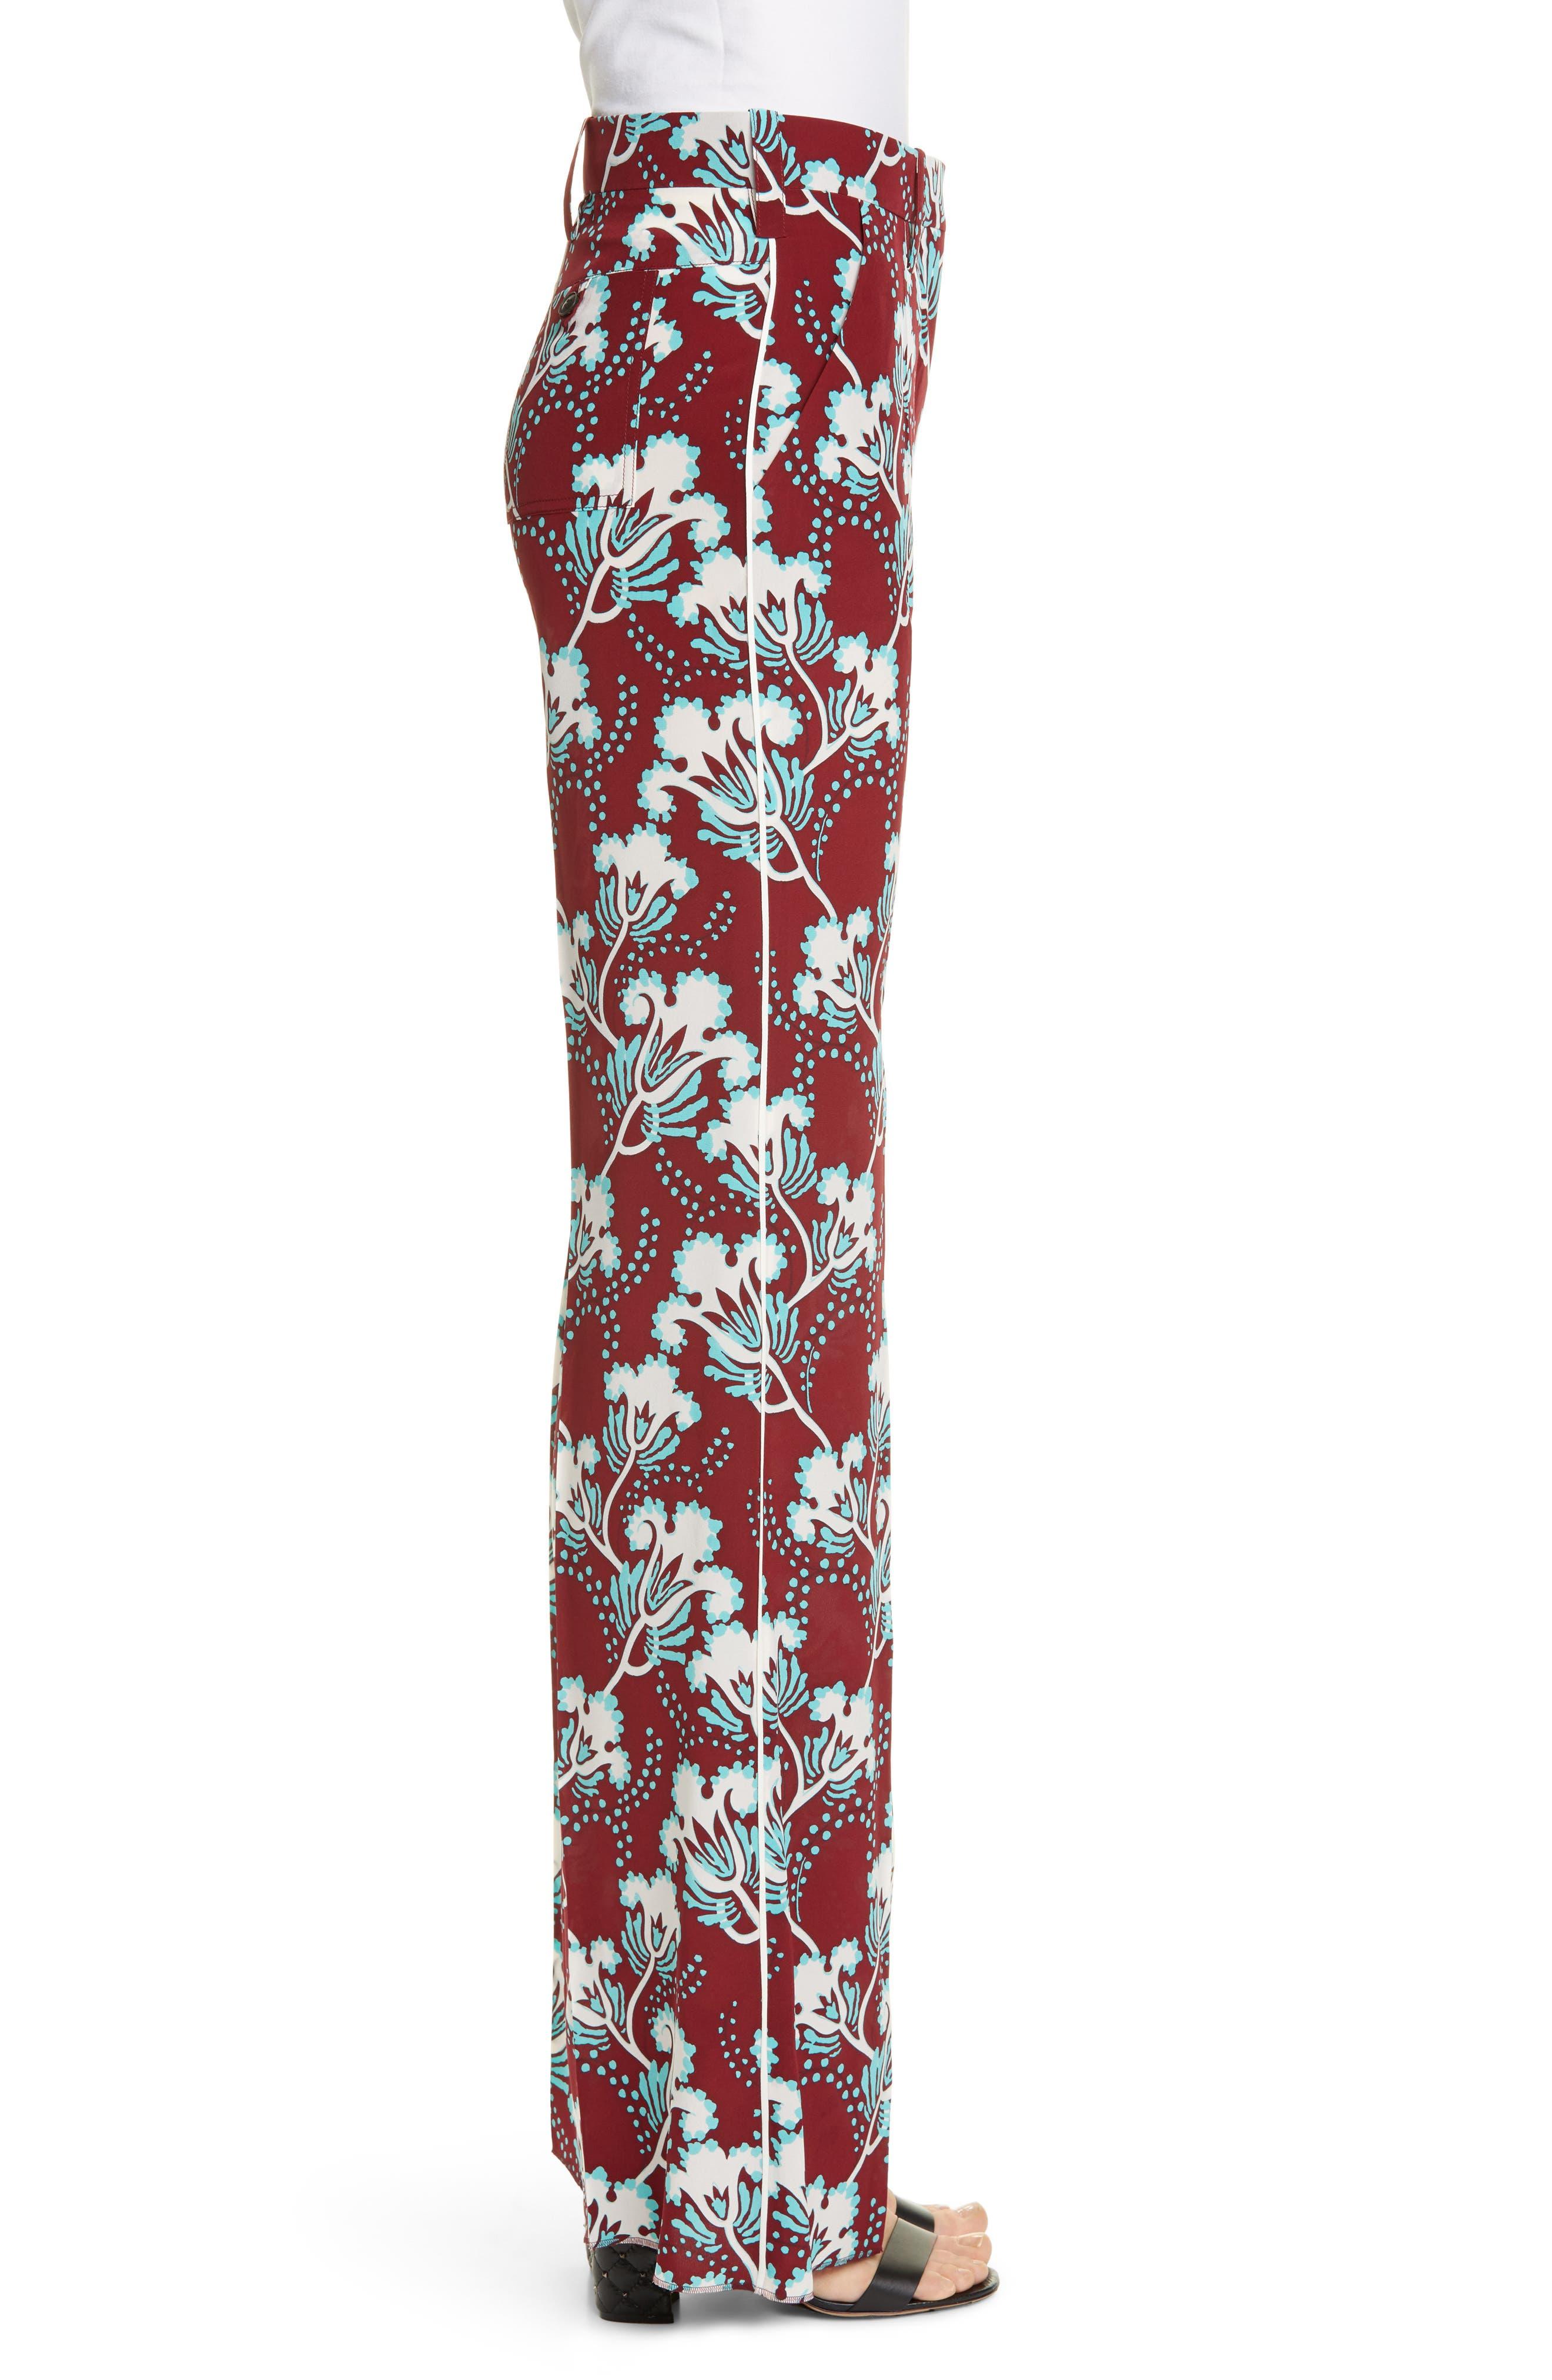 VALENTINO, Elderflower Print Wide Leg Silk Pants, Alternate thumbnail 3, color, GTB-GARNET/TURCHESE/BIANCO